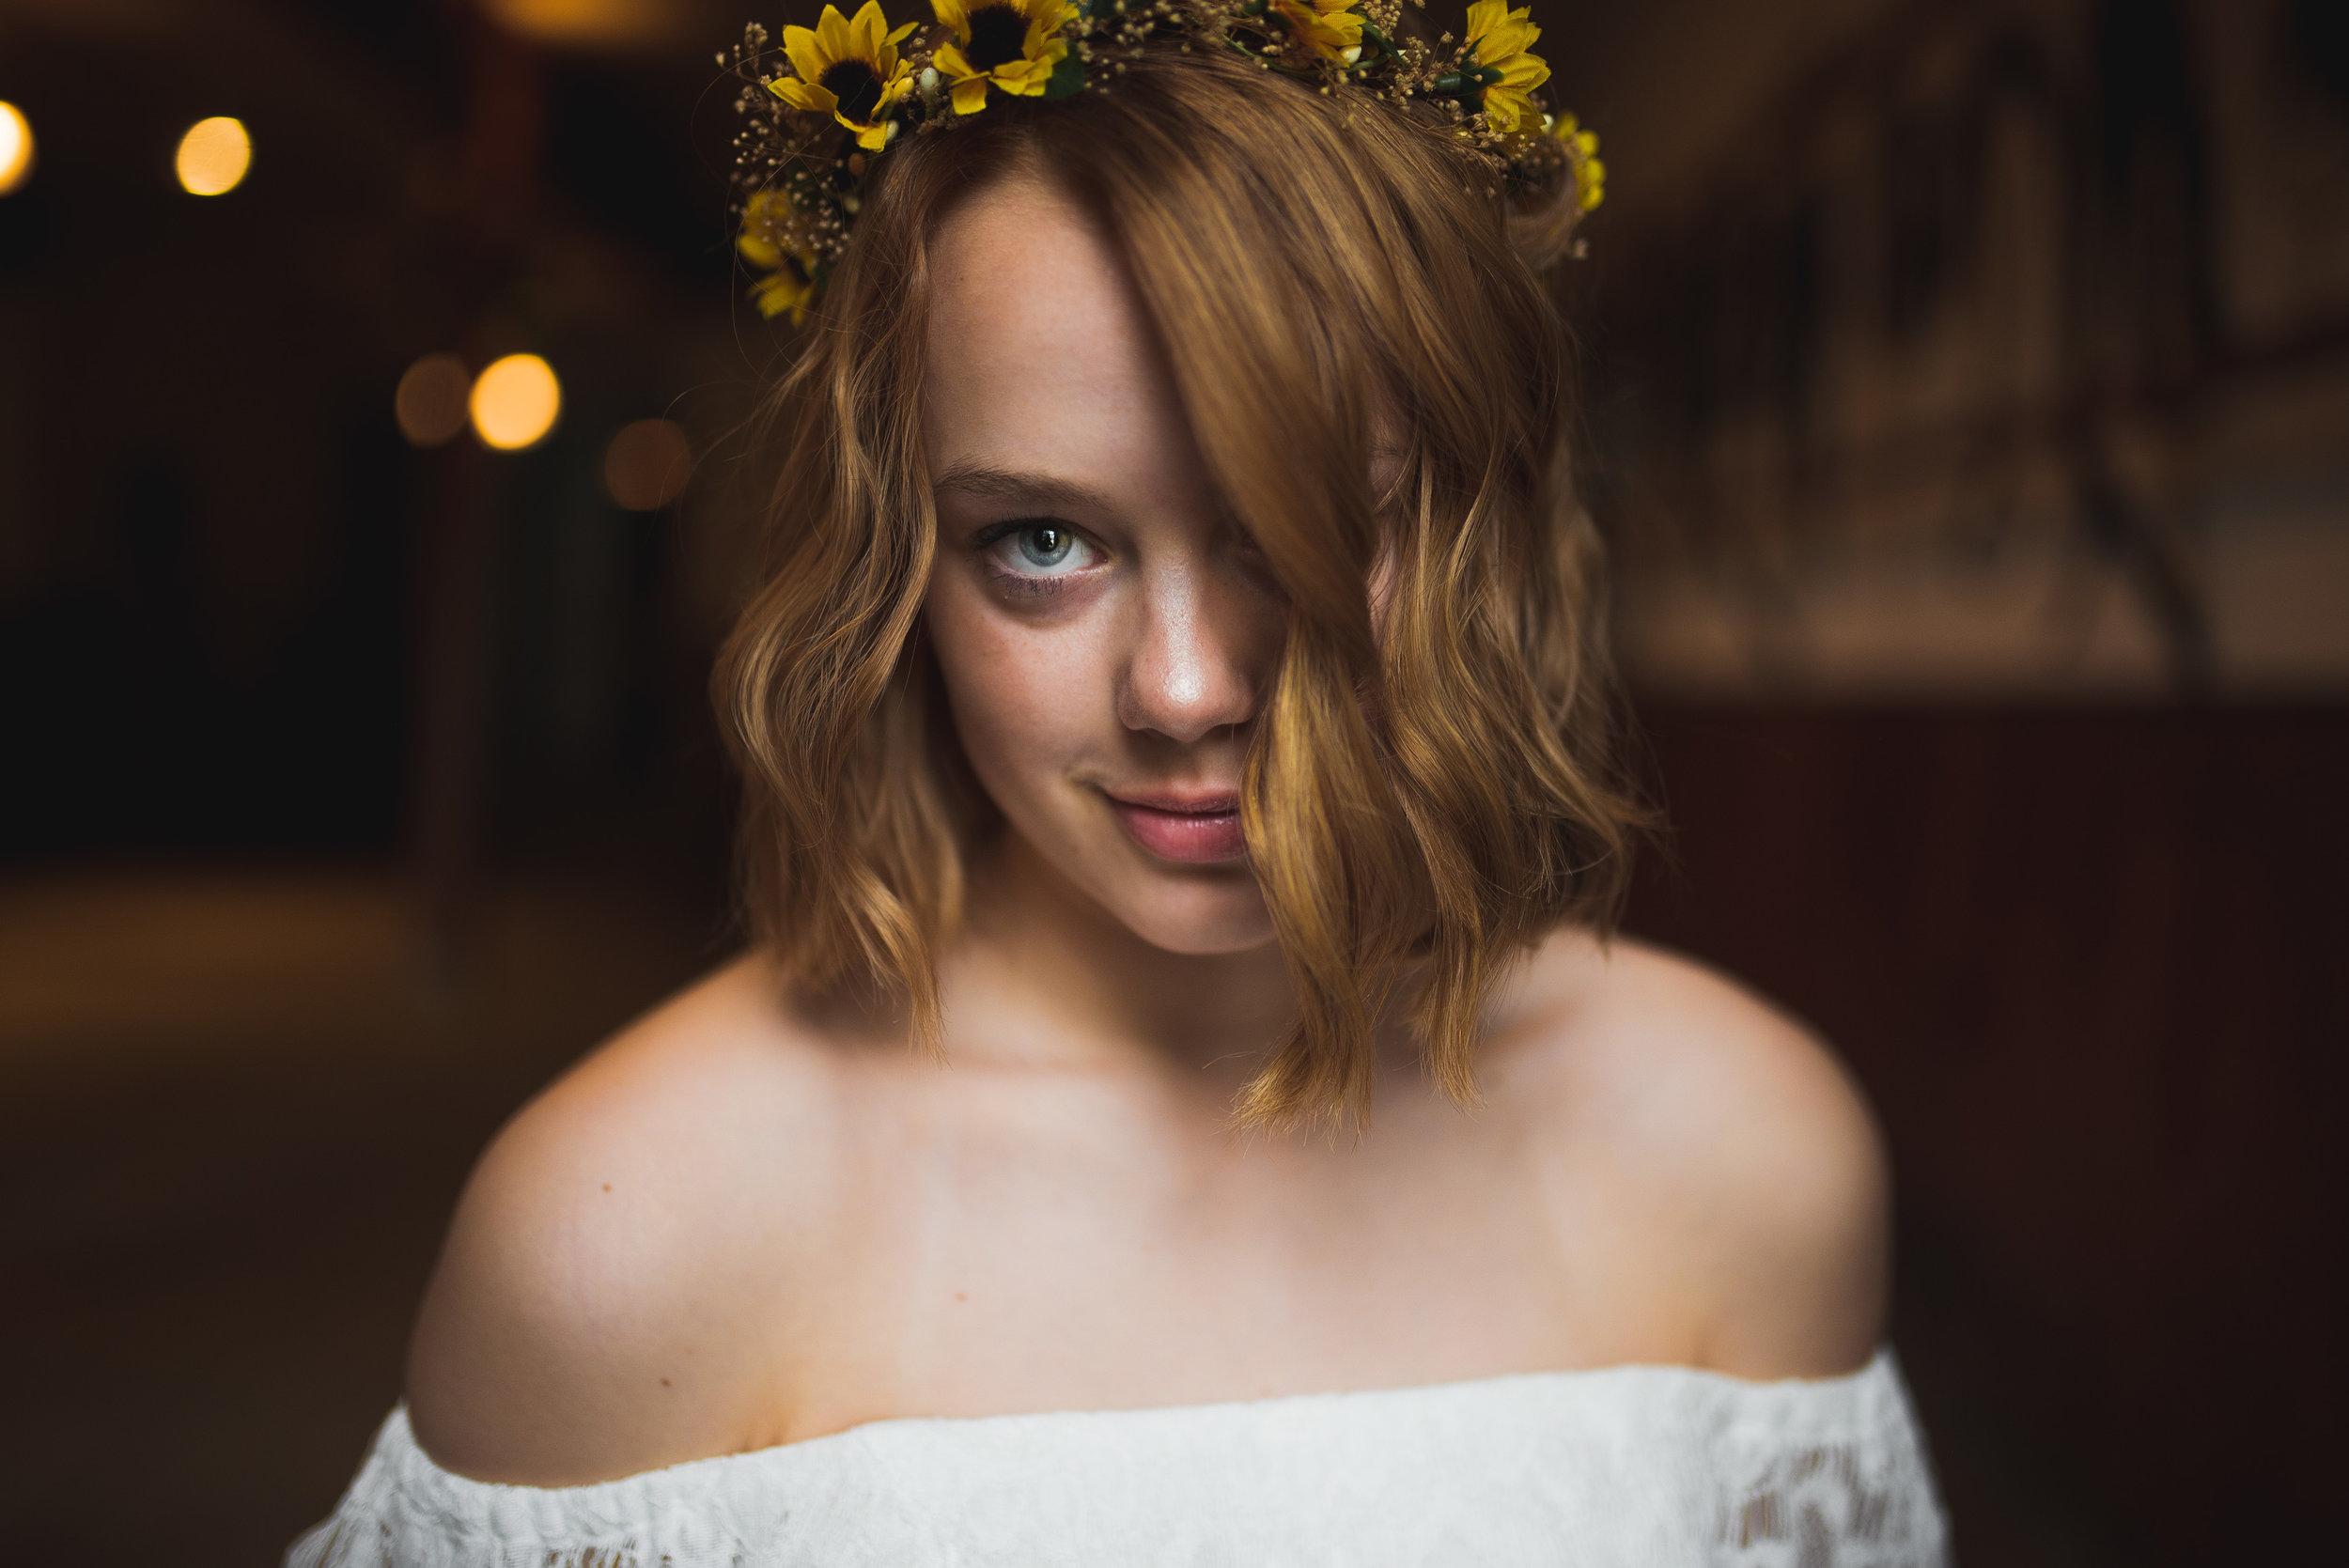 DetailsNashville - Hannah + Peyton Wedding - Nashville